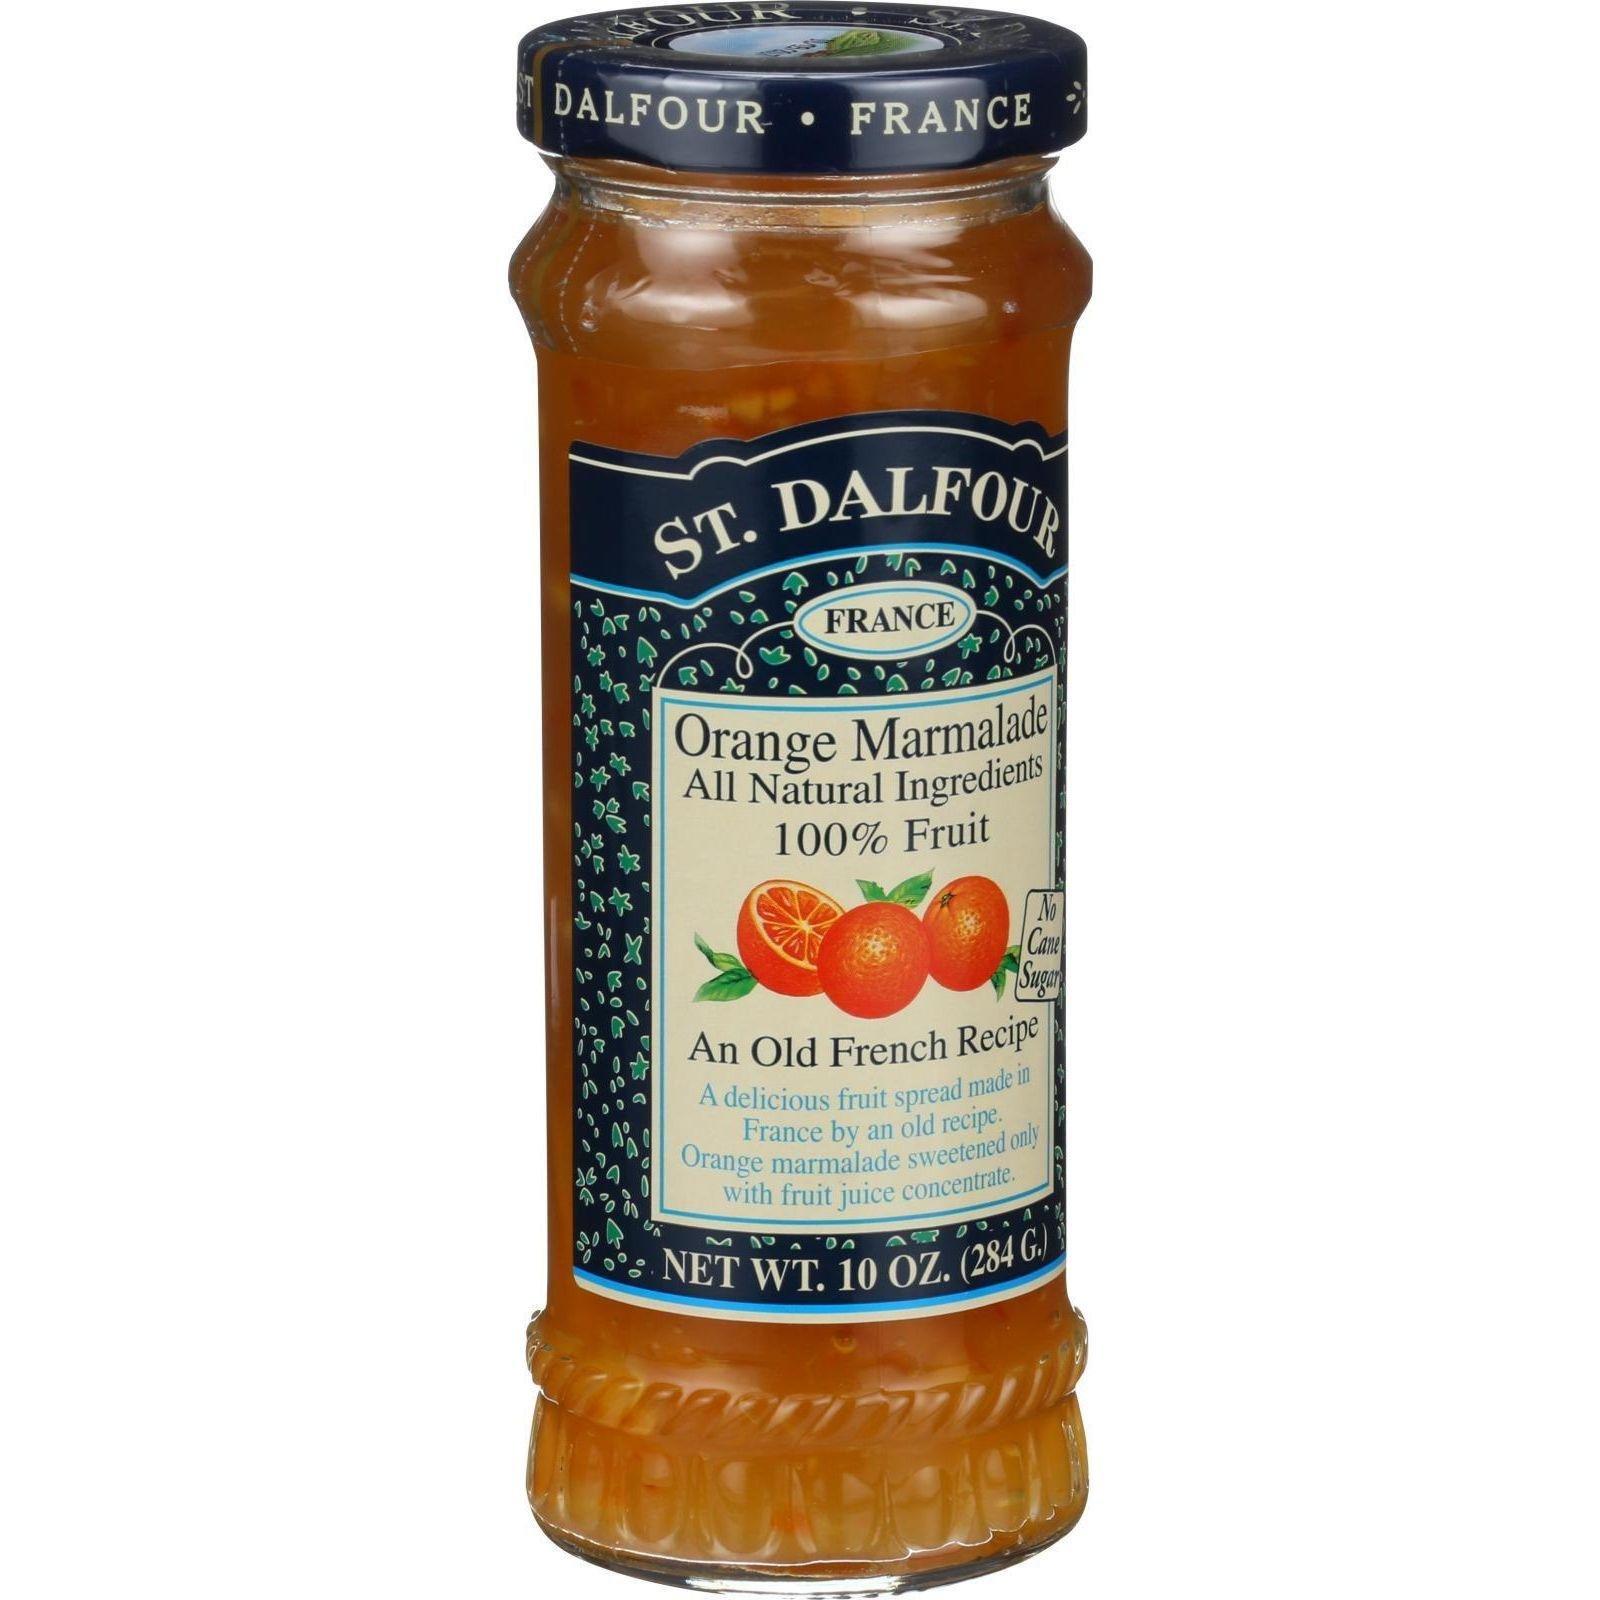 St Dalfour Orange Marmalade 100% Fruit Conserve